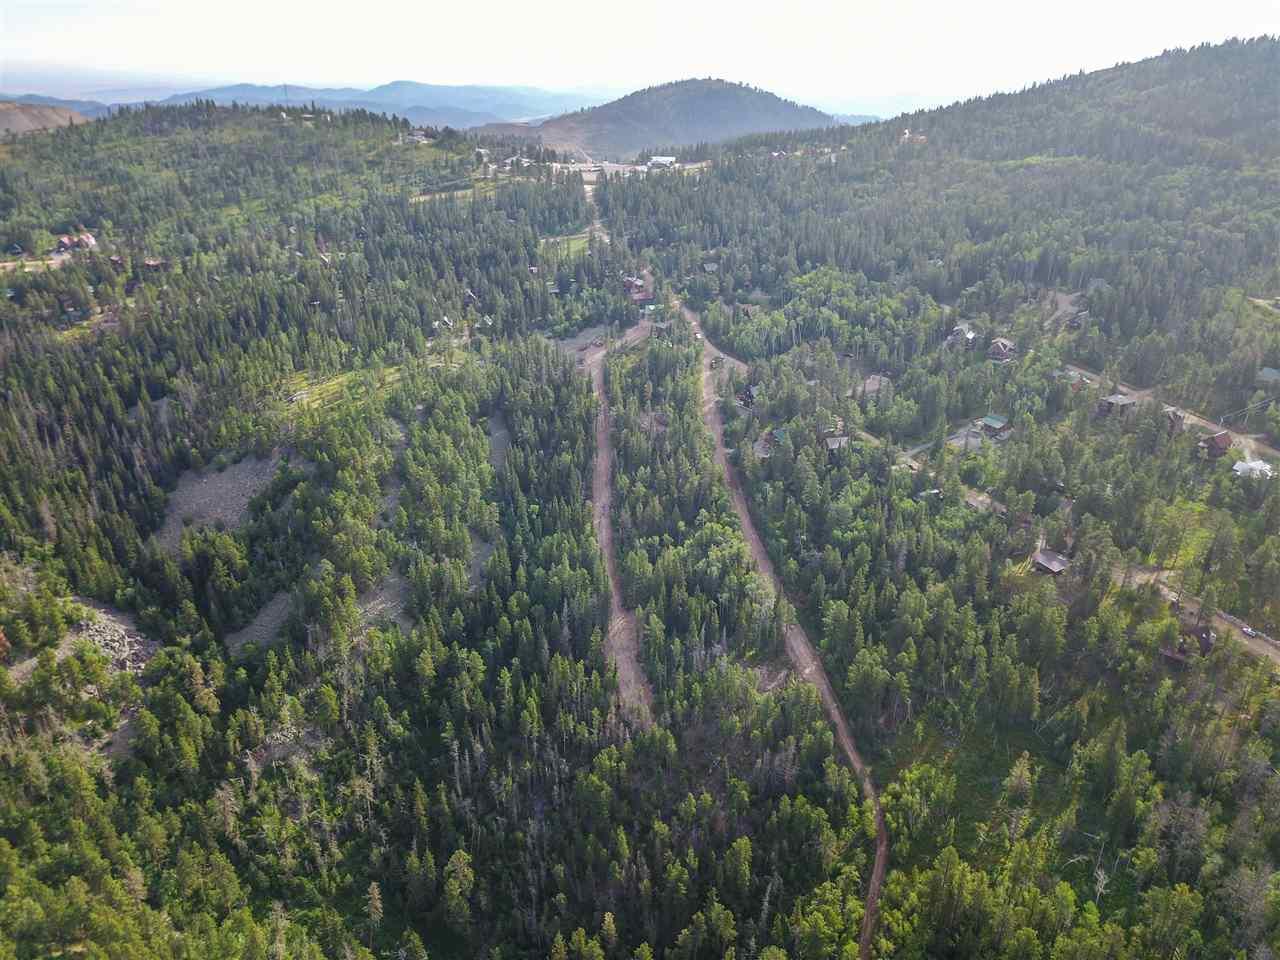 TBD 18 Lost Camp Trail